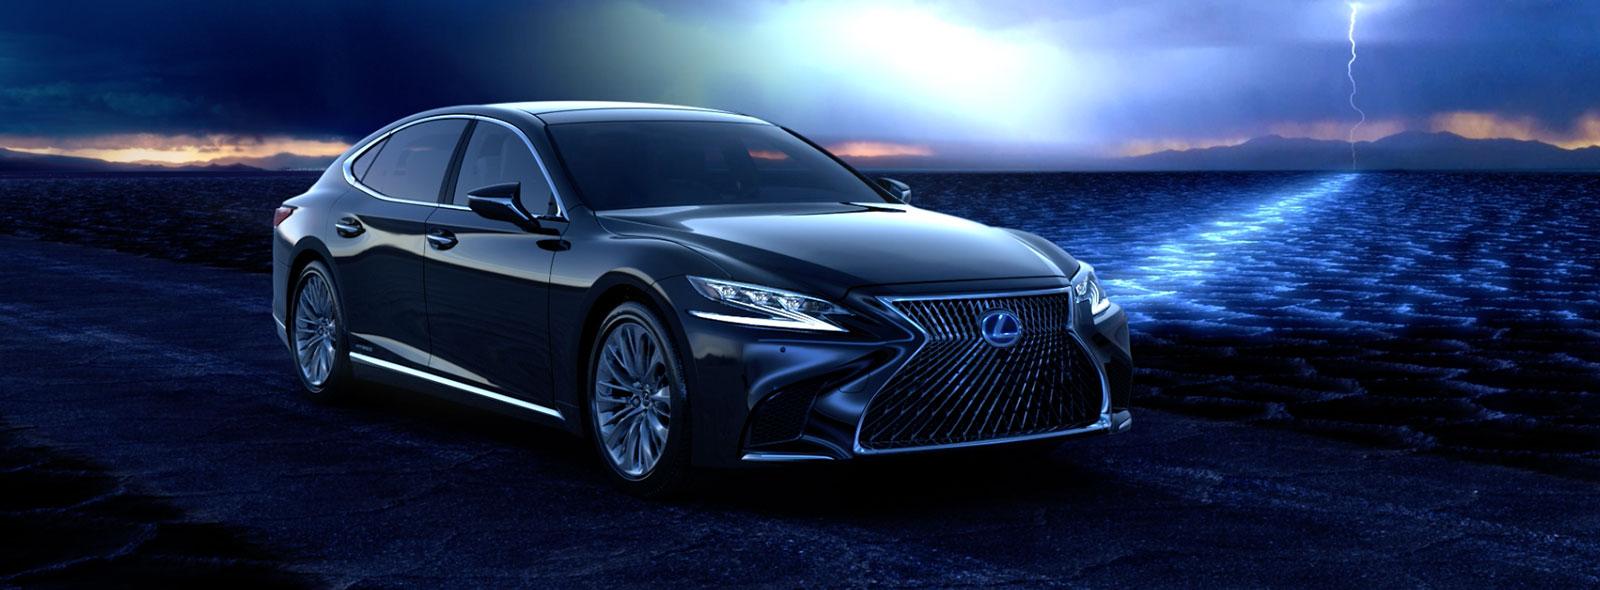 2018 Lexus LS Geneva Launch Video